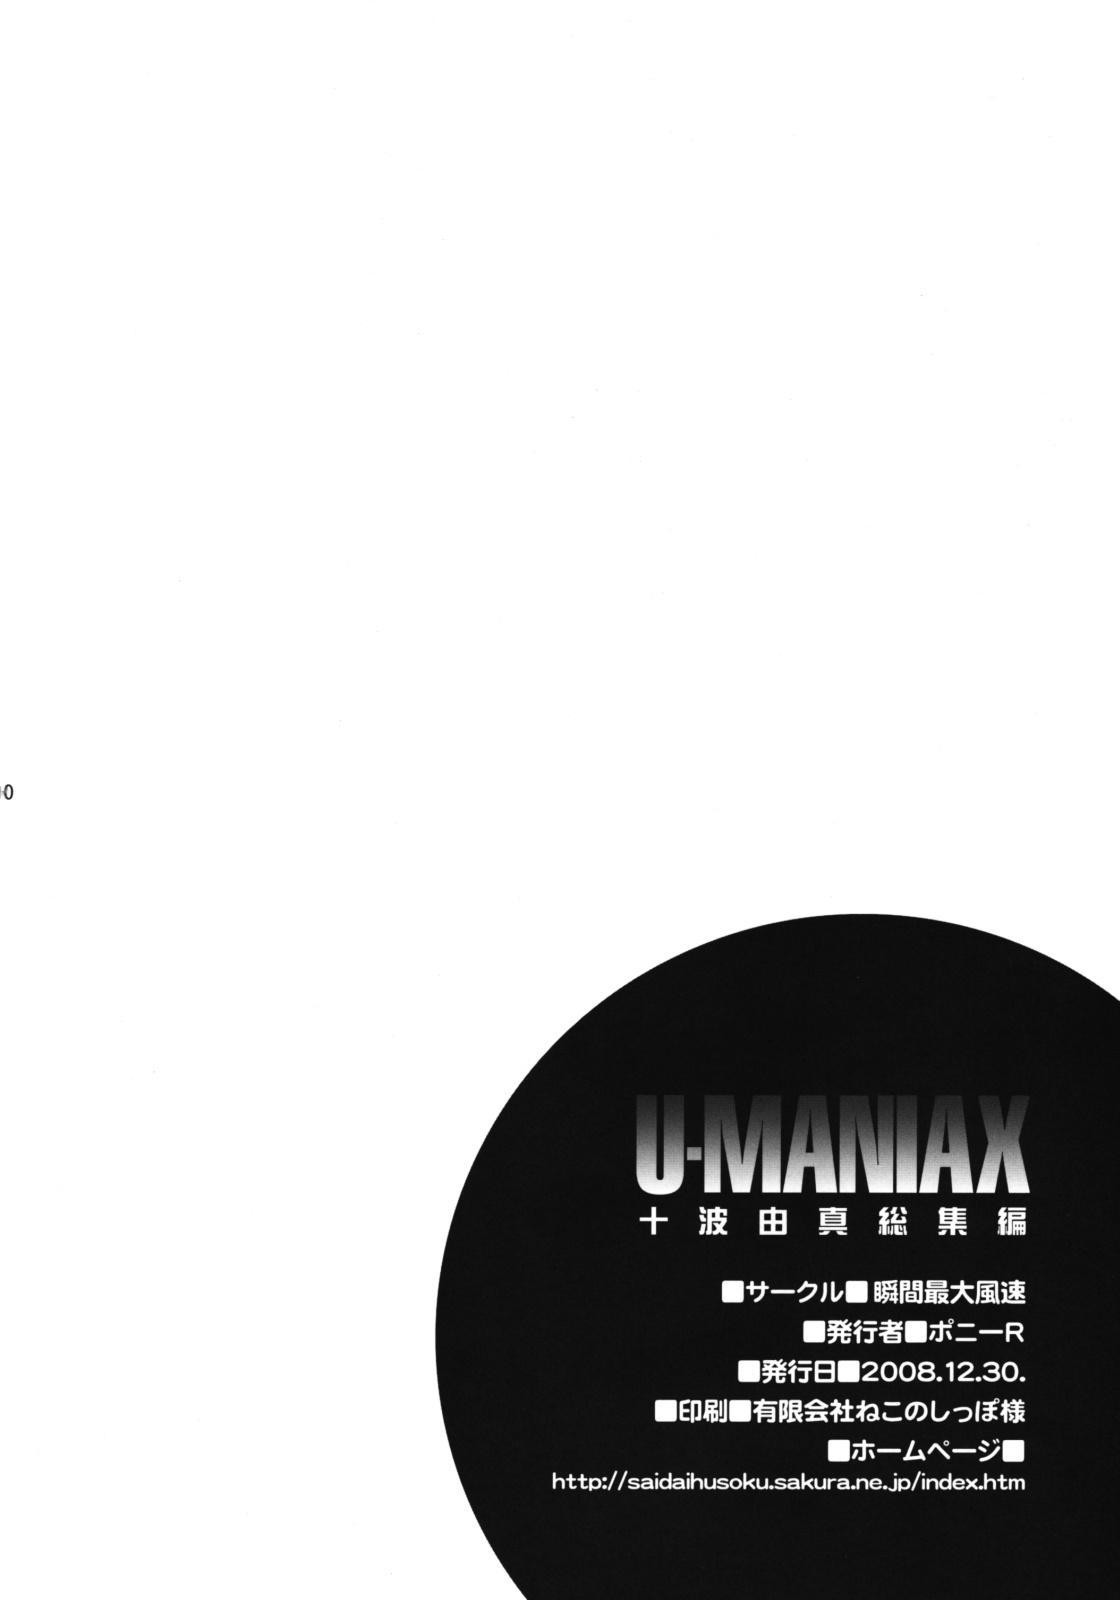 U-Maniax Tonami Yuma Soushuuhen 108